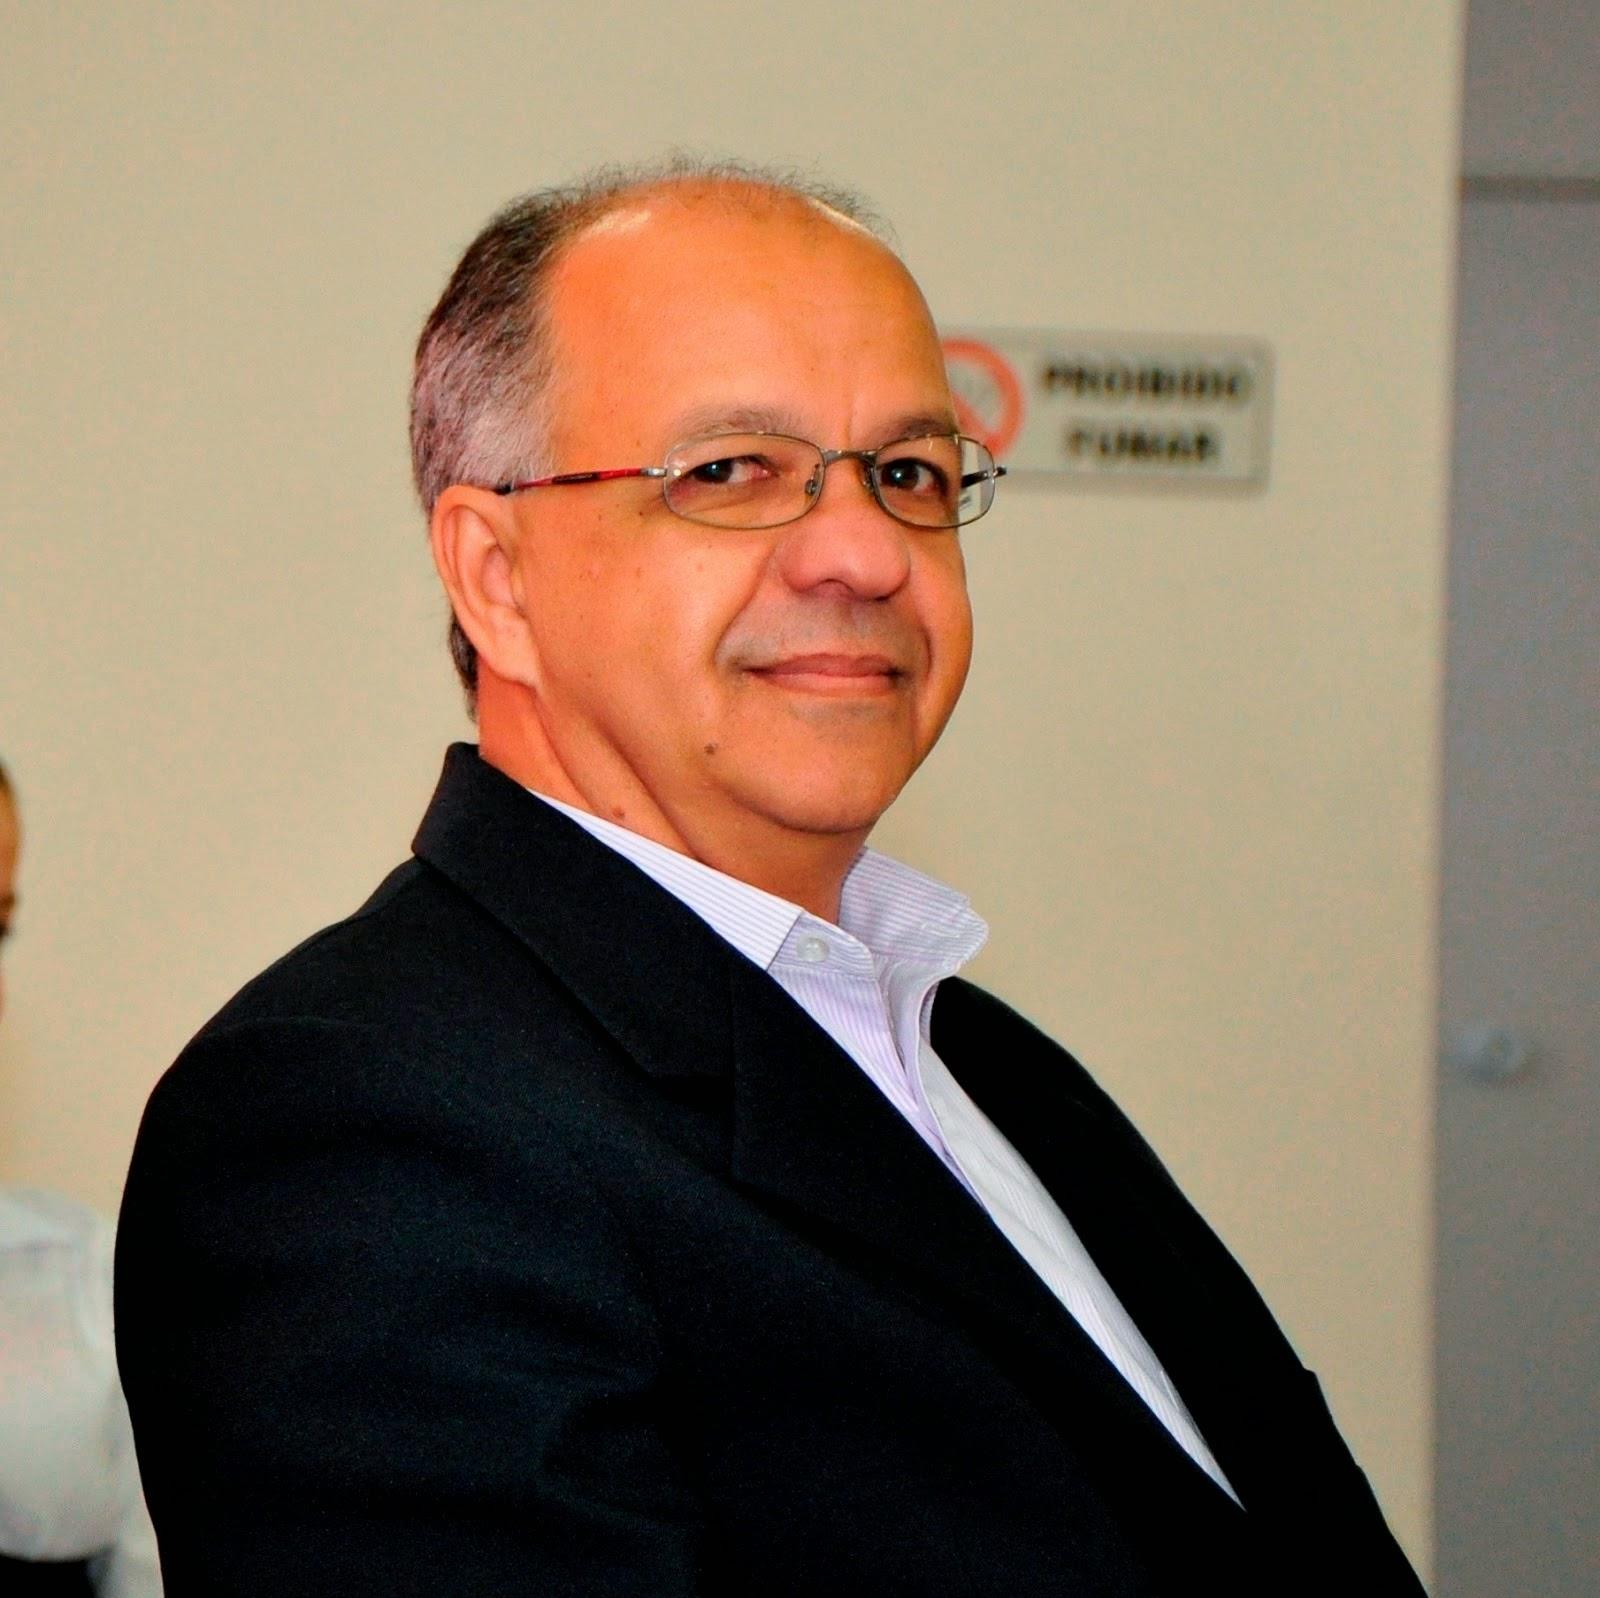 LucianoMalpelli.blogspot.com.br